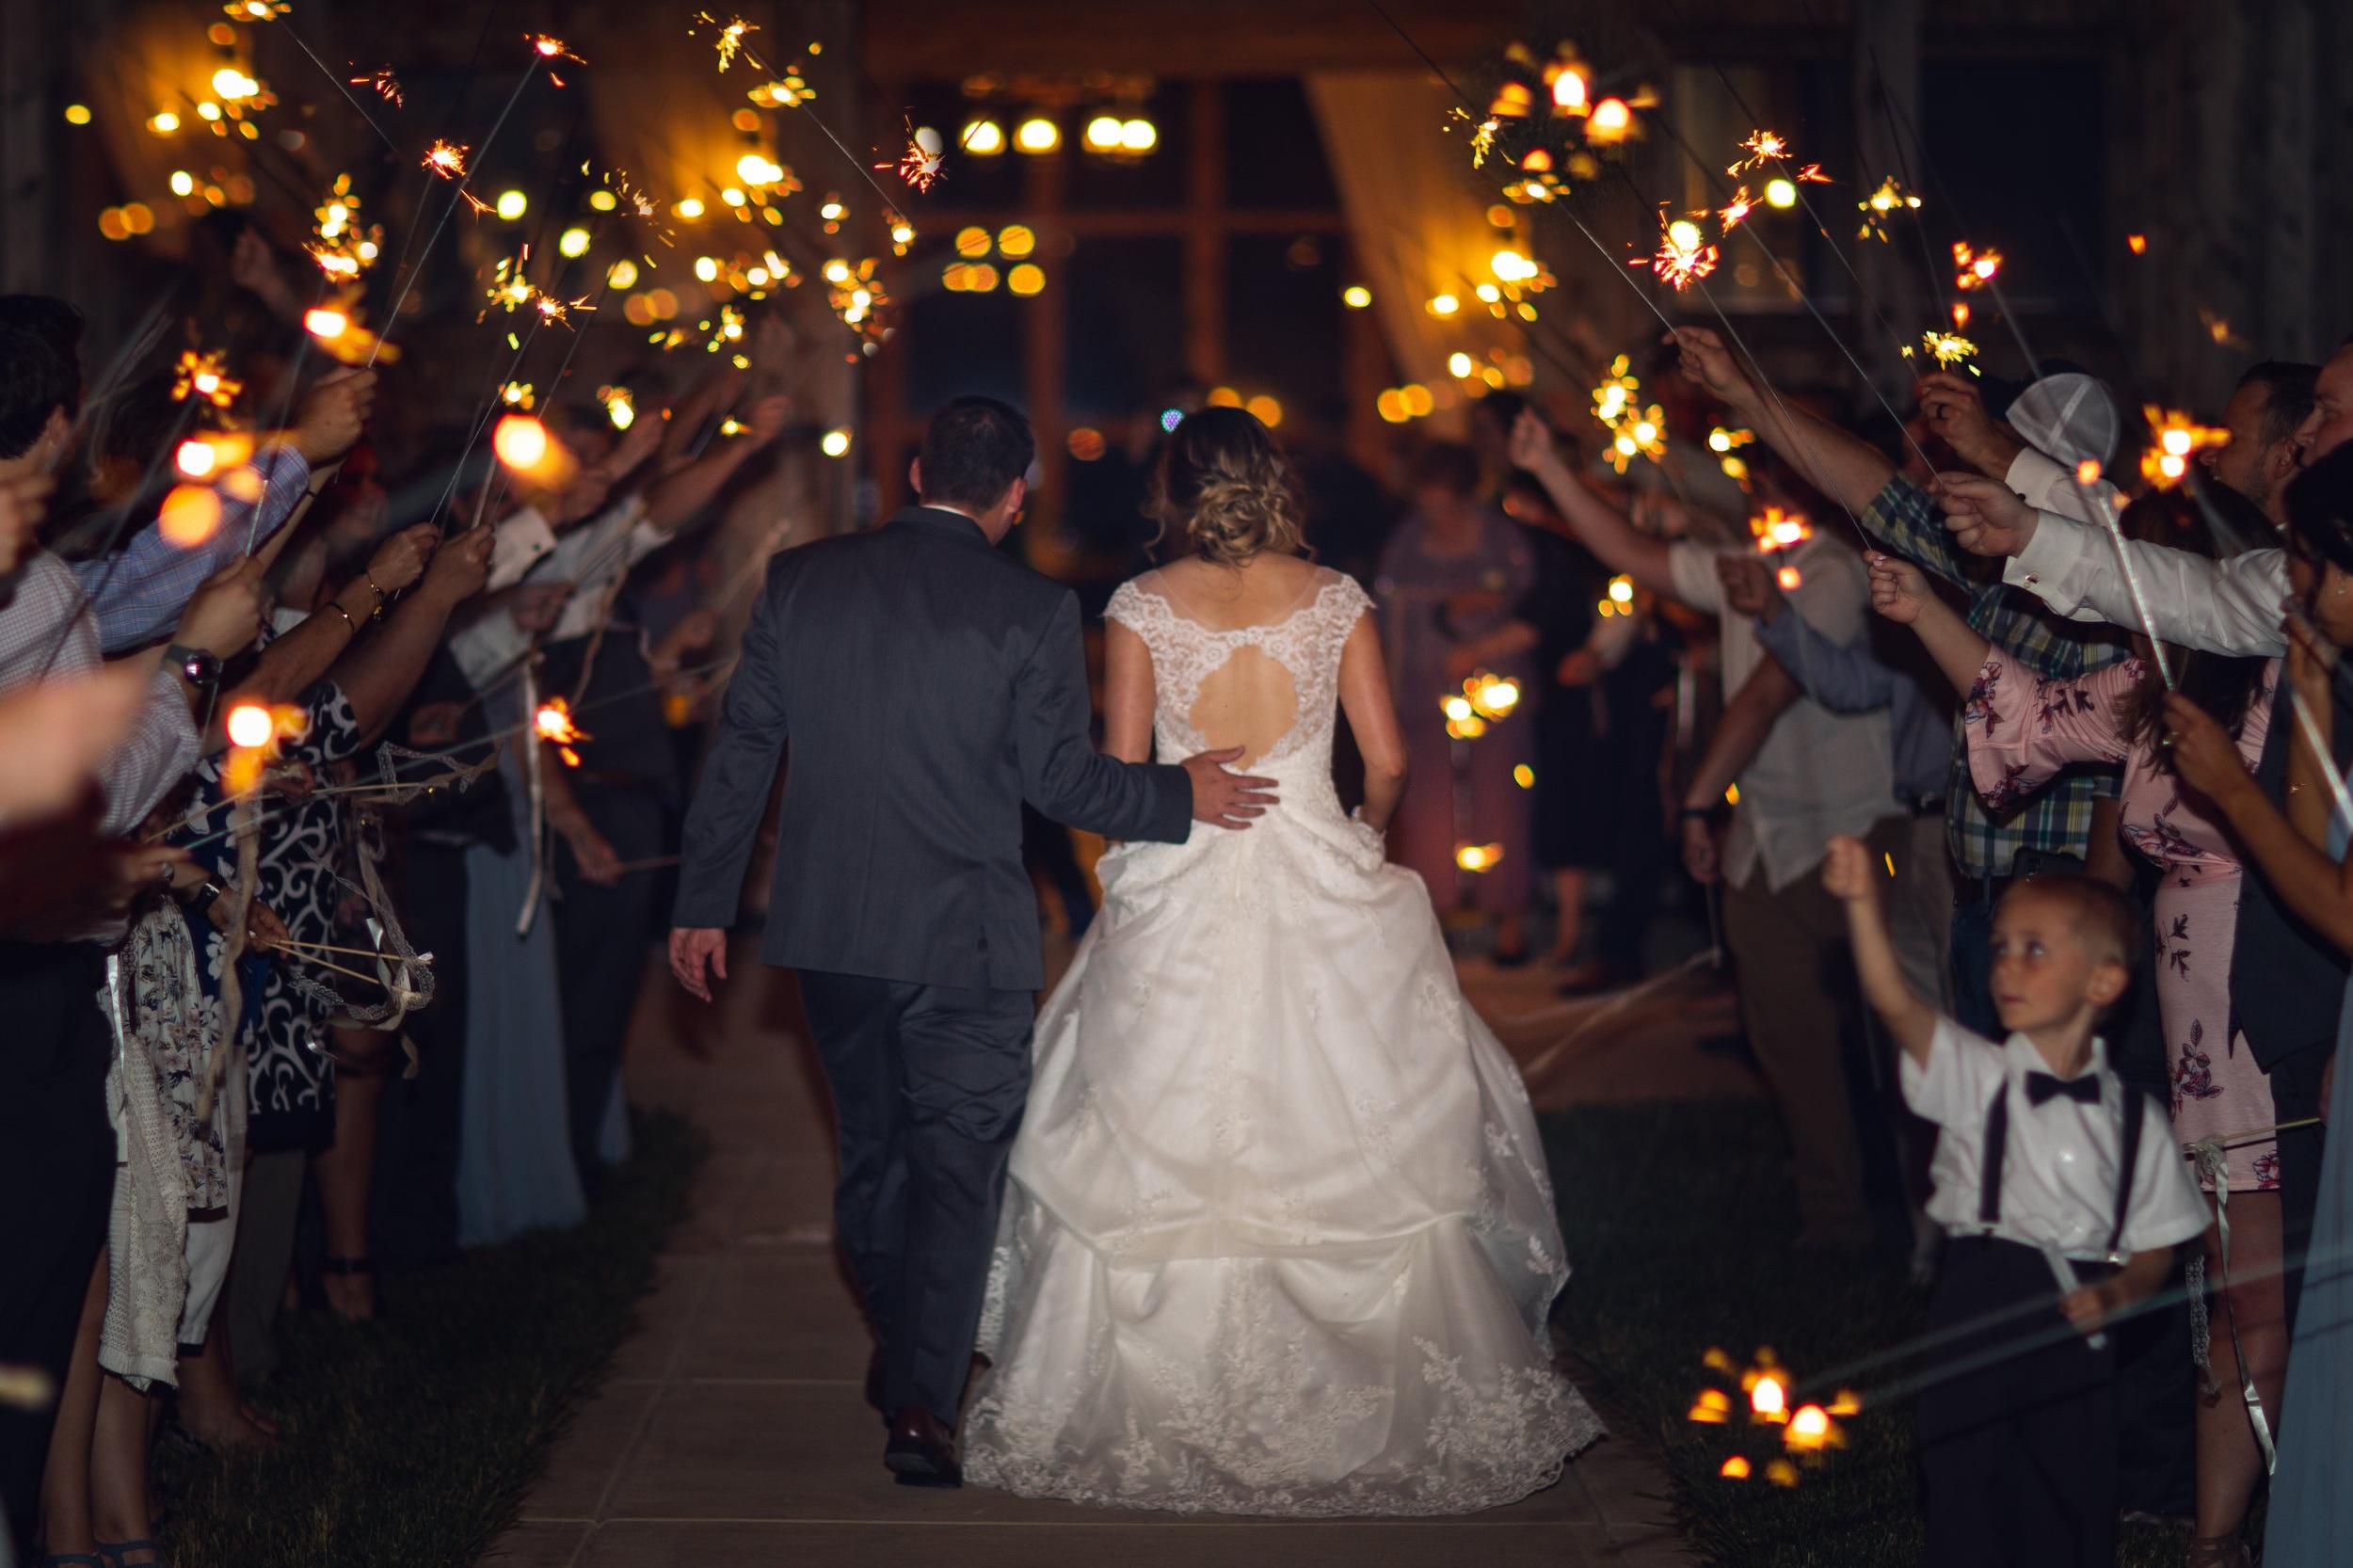 randi-schuette-photo-the-barn-at-heritage-farm-nc-wedding-edwards-reception165.jpg